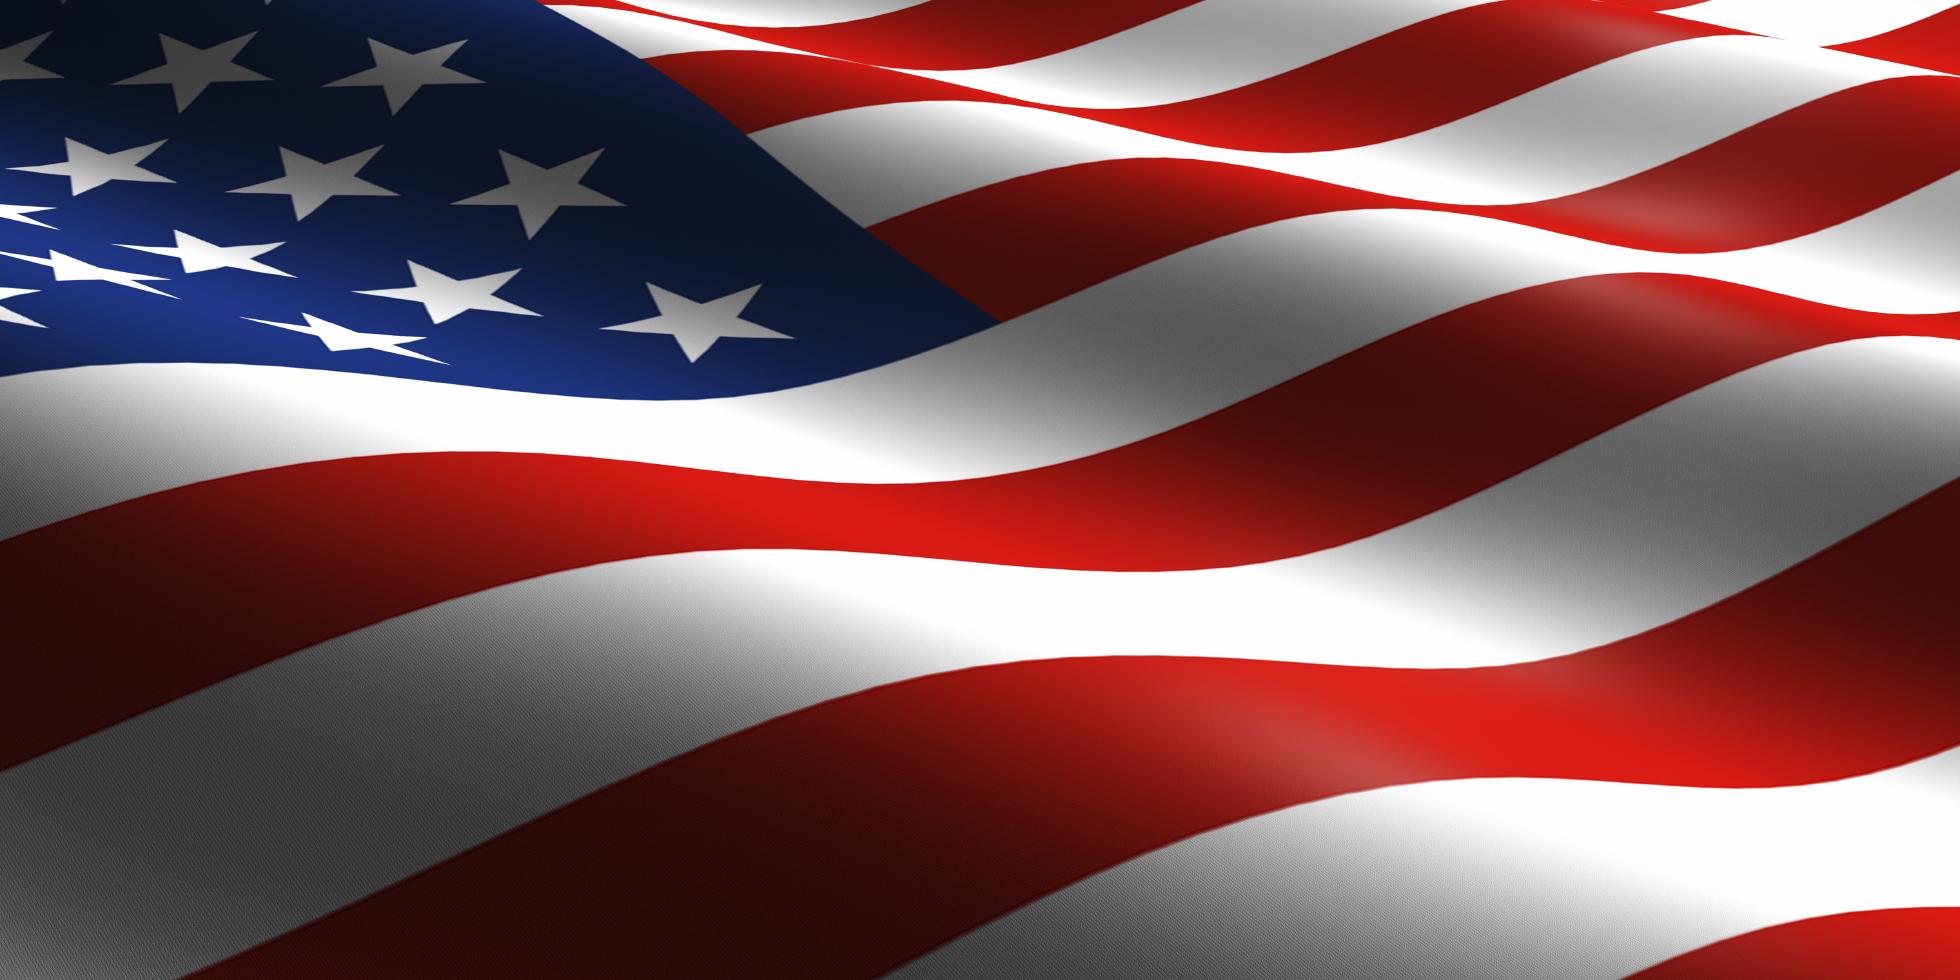 USA Flag Wallpaper 1960x980